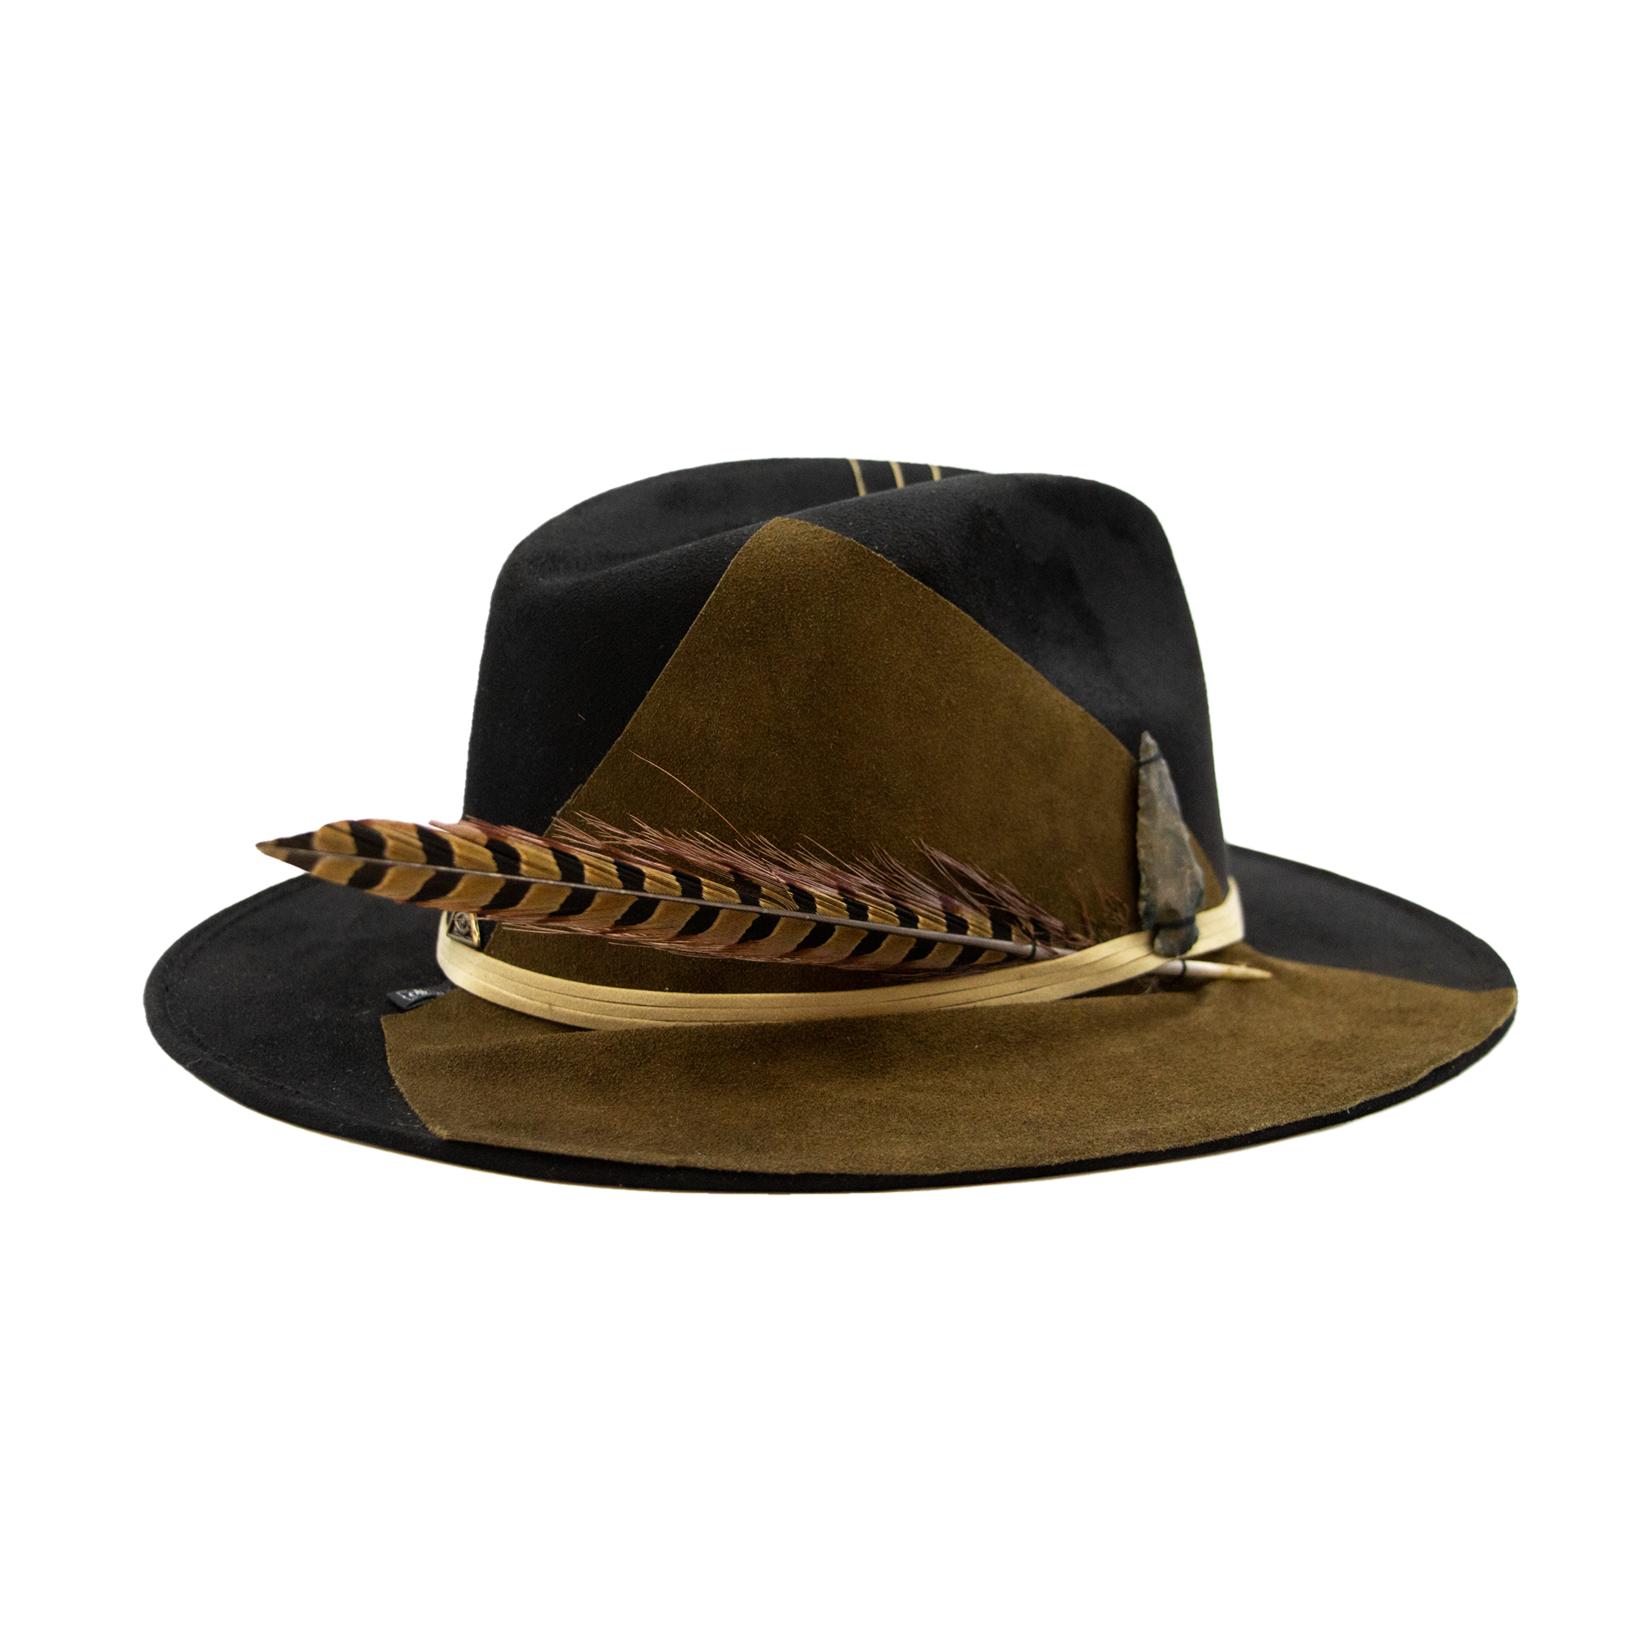 Tuluminati Tekiwa Suede Hat Black